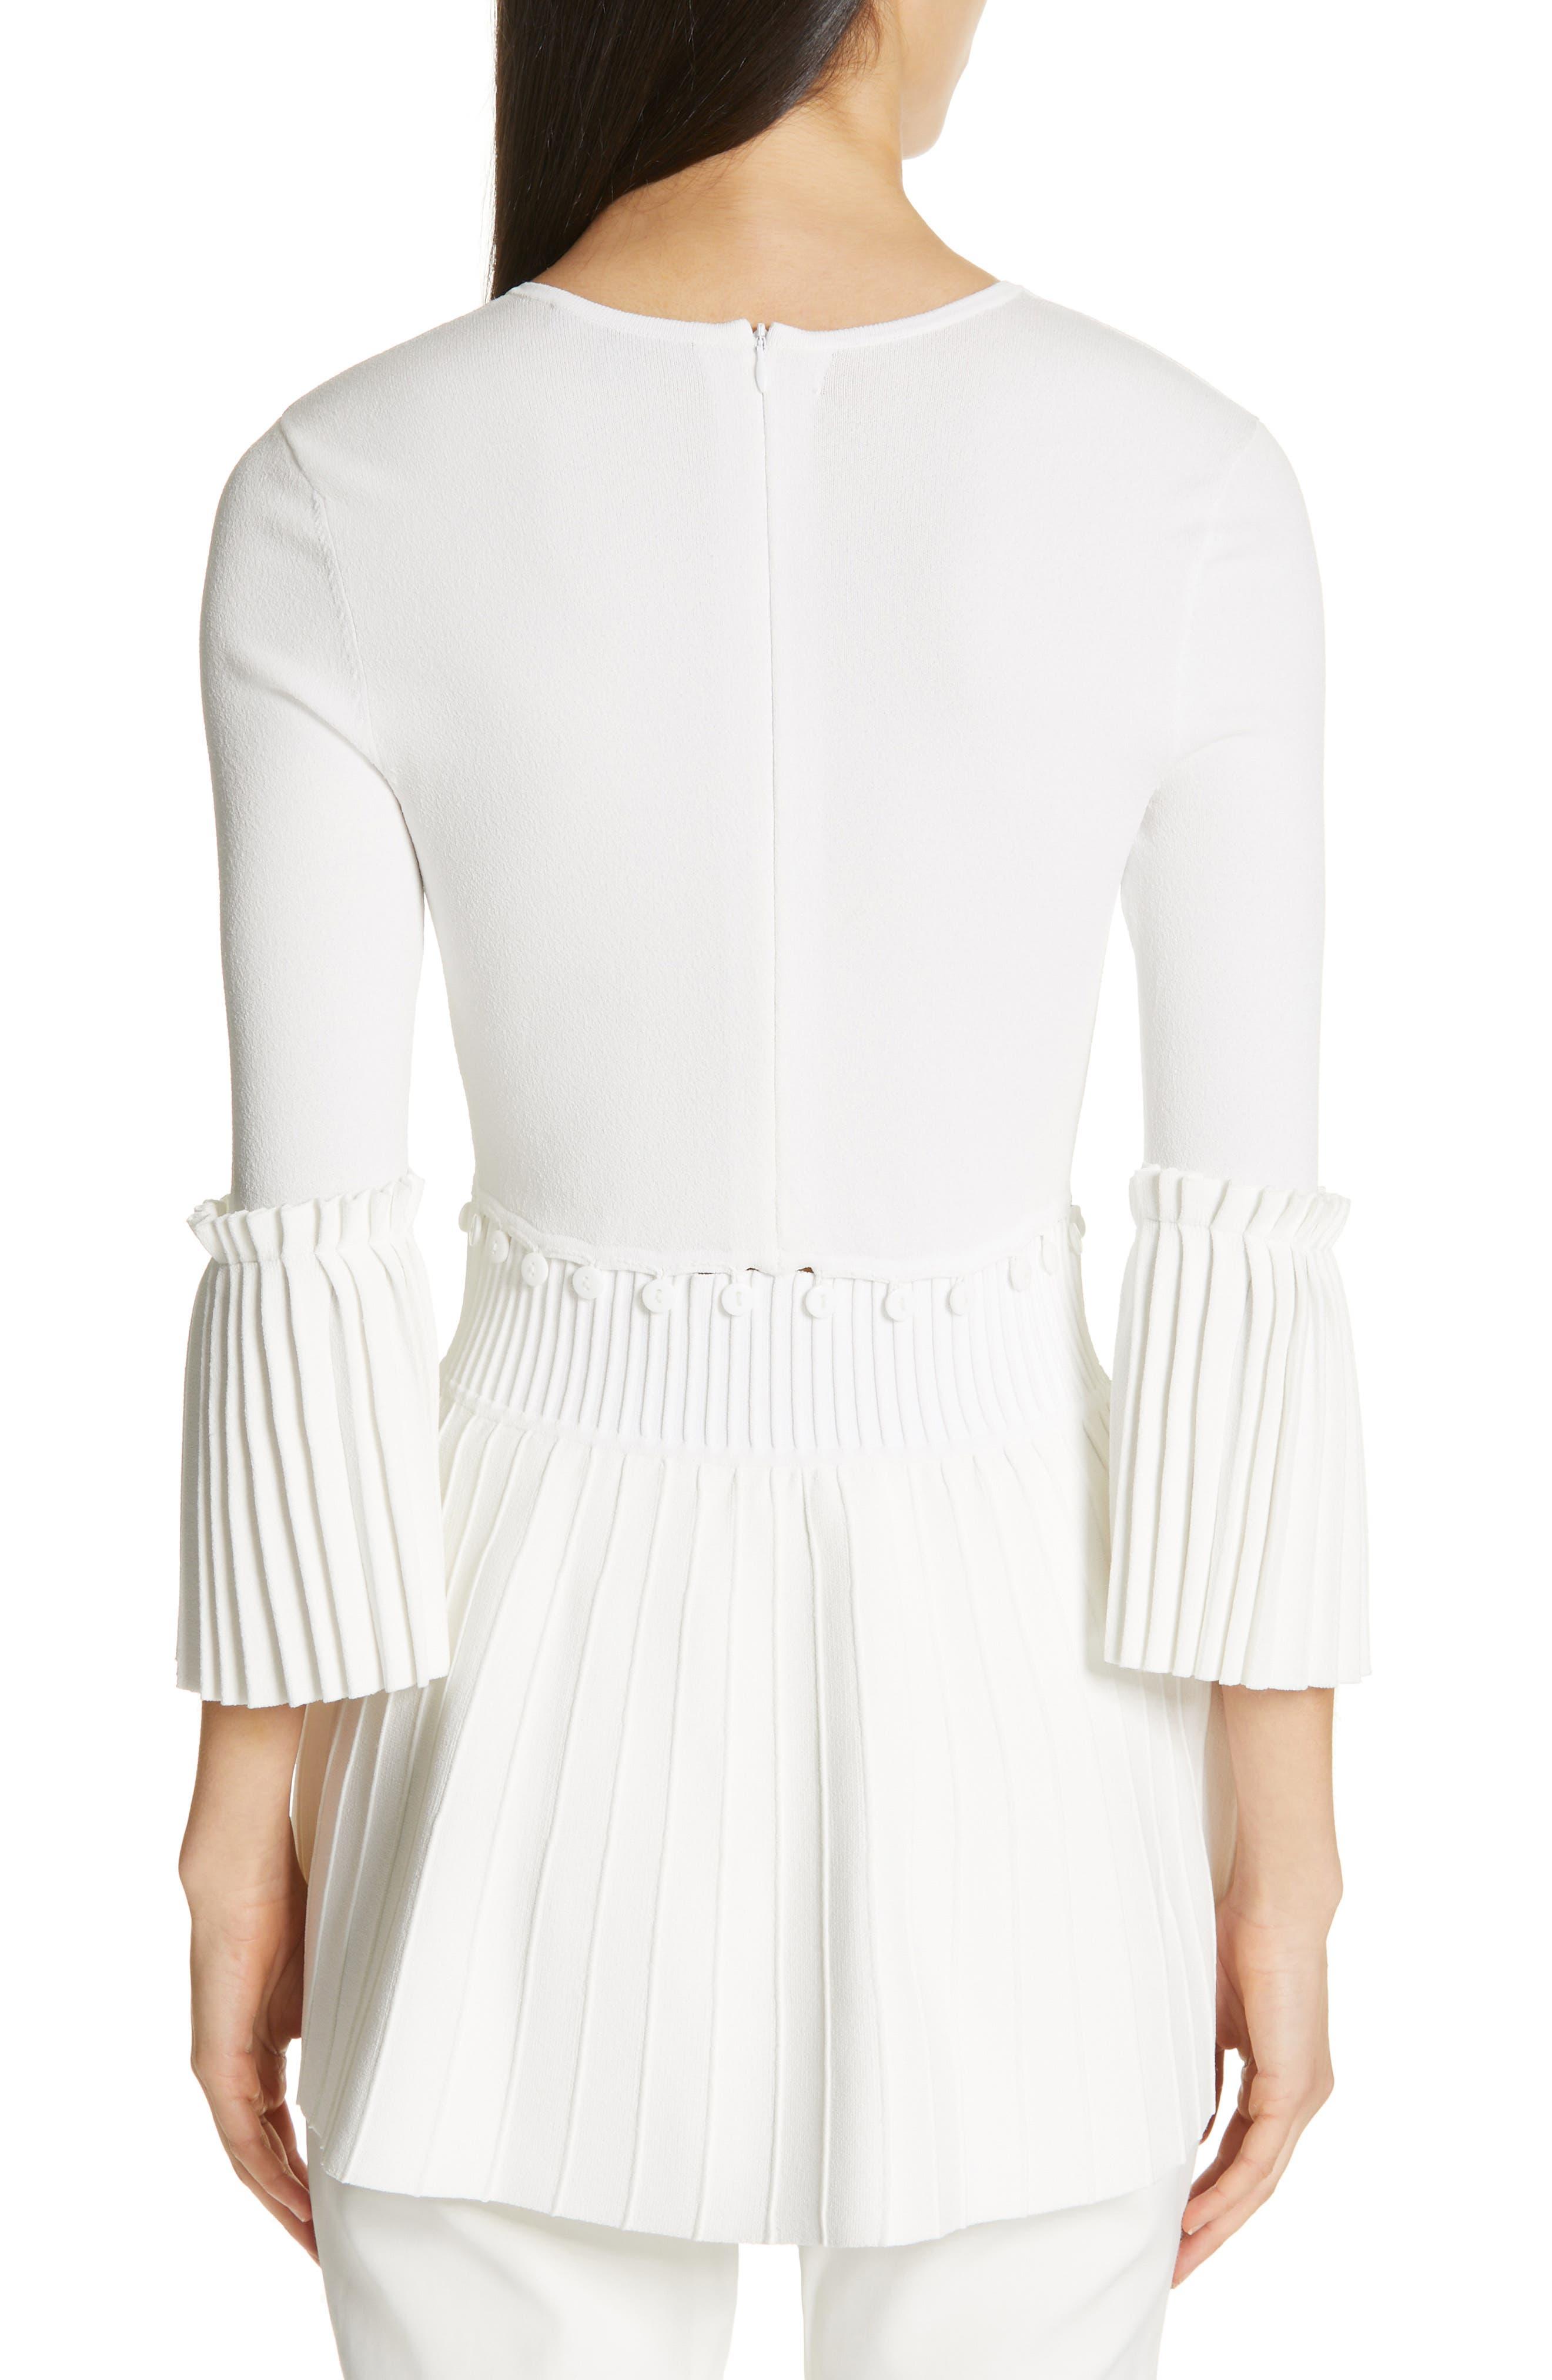 LELA ROSE,                             Pleated Knit Top,                             Alternate thumbnail 2, color,                             WHITE